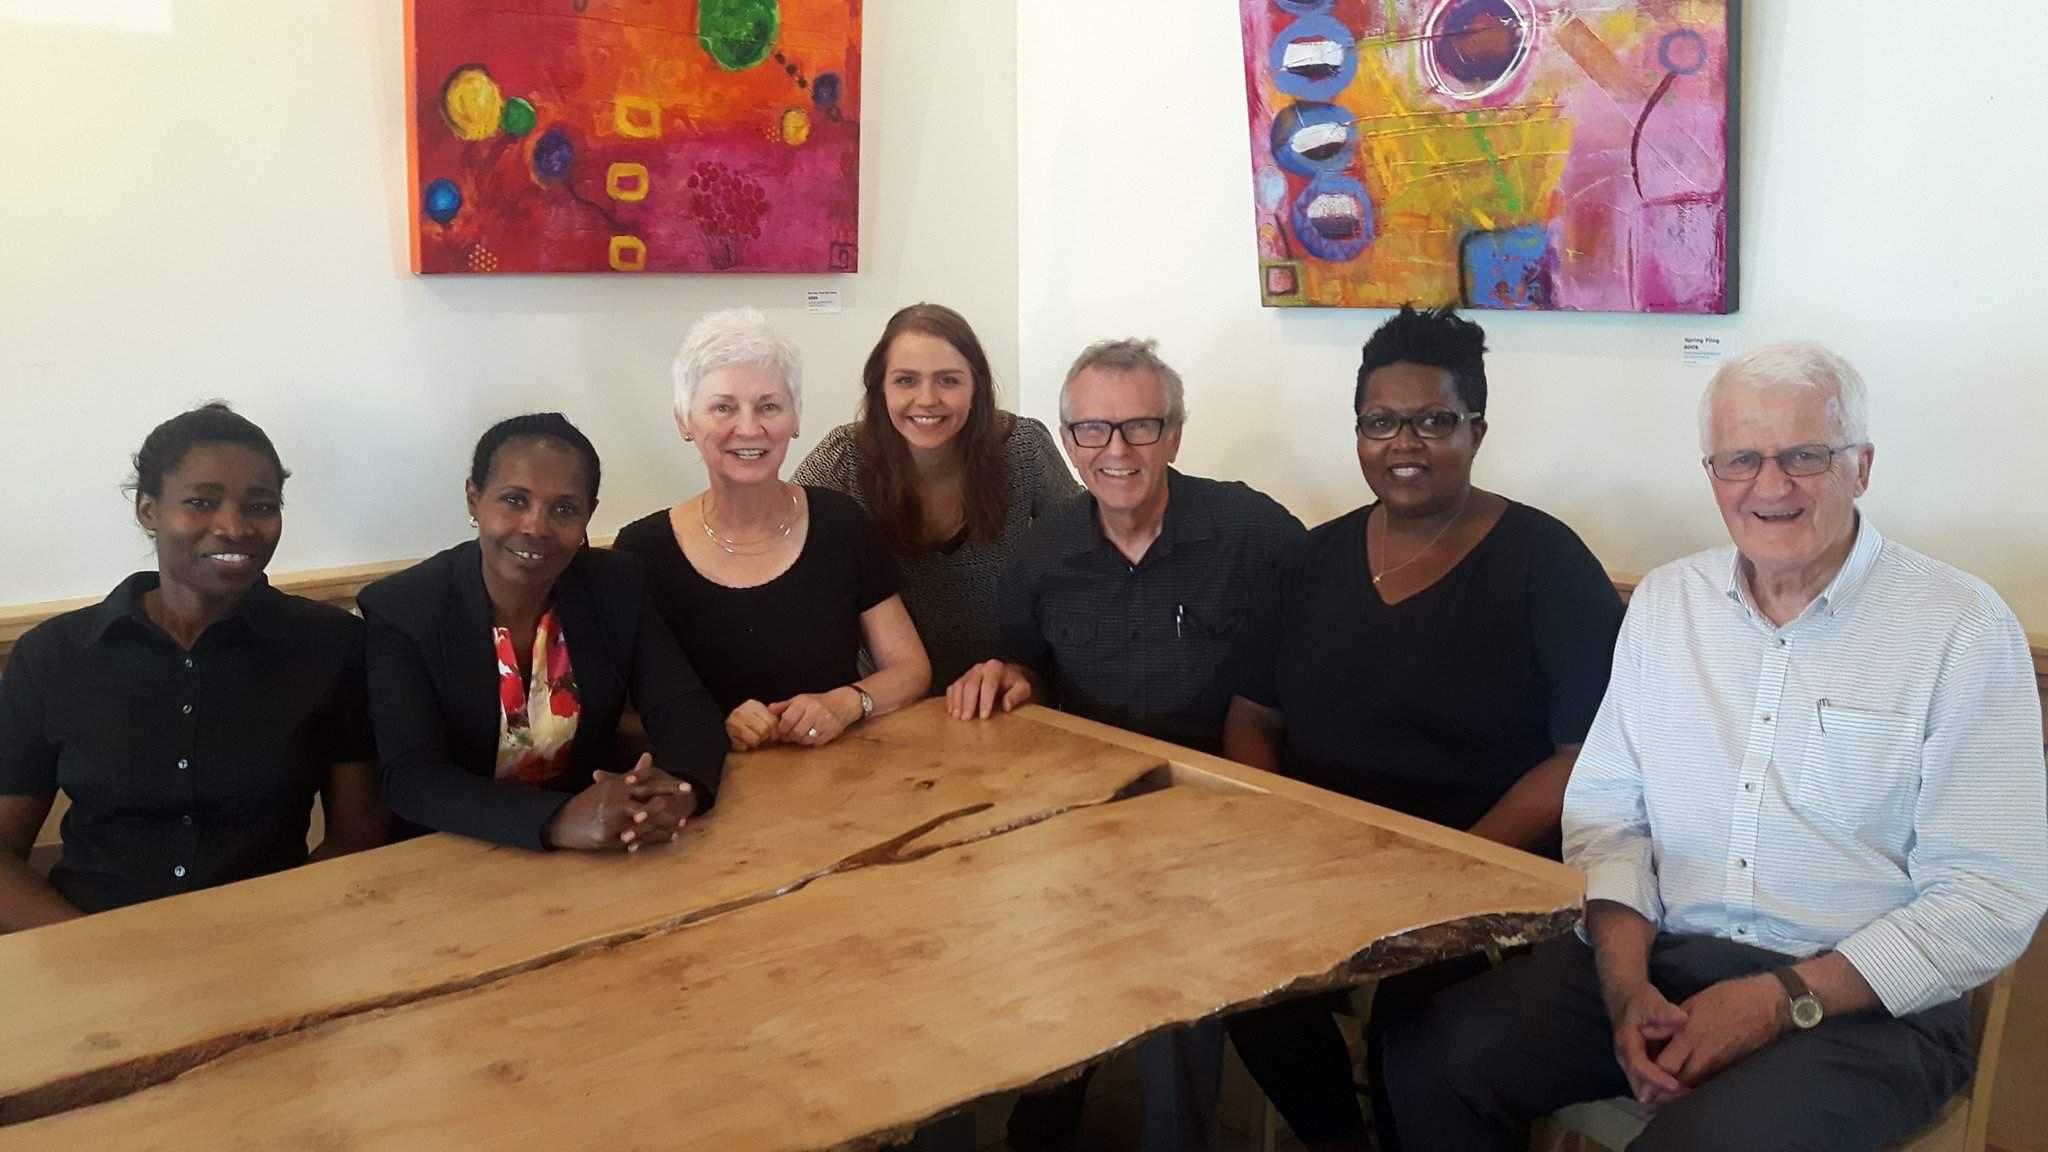 De gauche à droite: Evelyne Kwizera, Delphine Furaha, Judy Allard, Hortense Bleytou, Vern N. Redekop, Anne-Marie Habyalimana and Pierre Allard